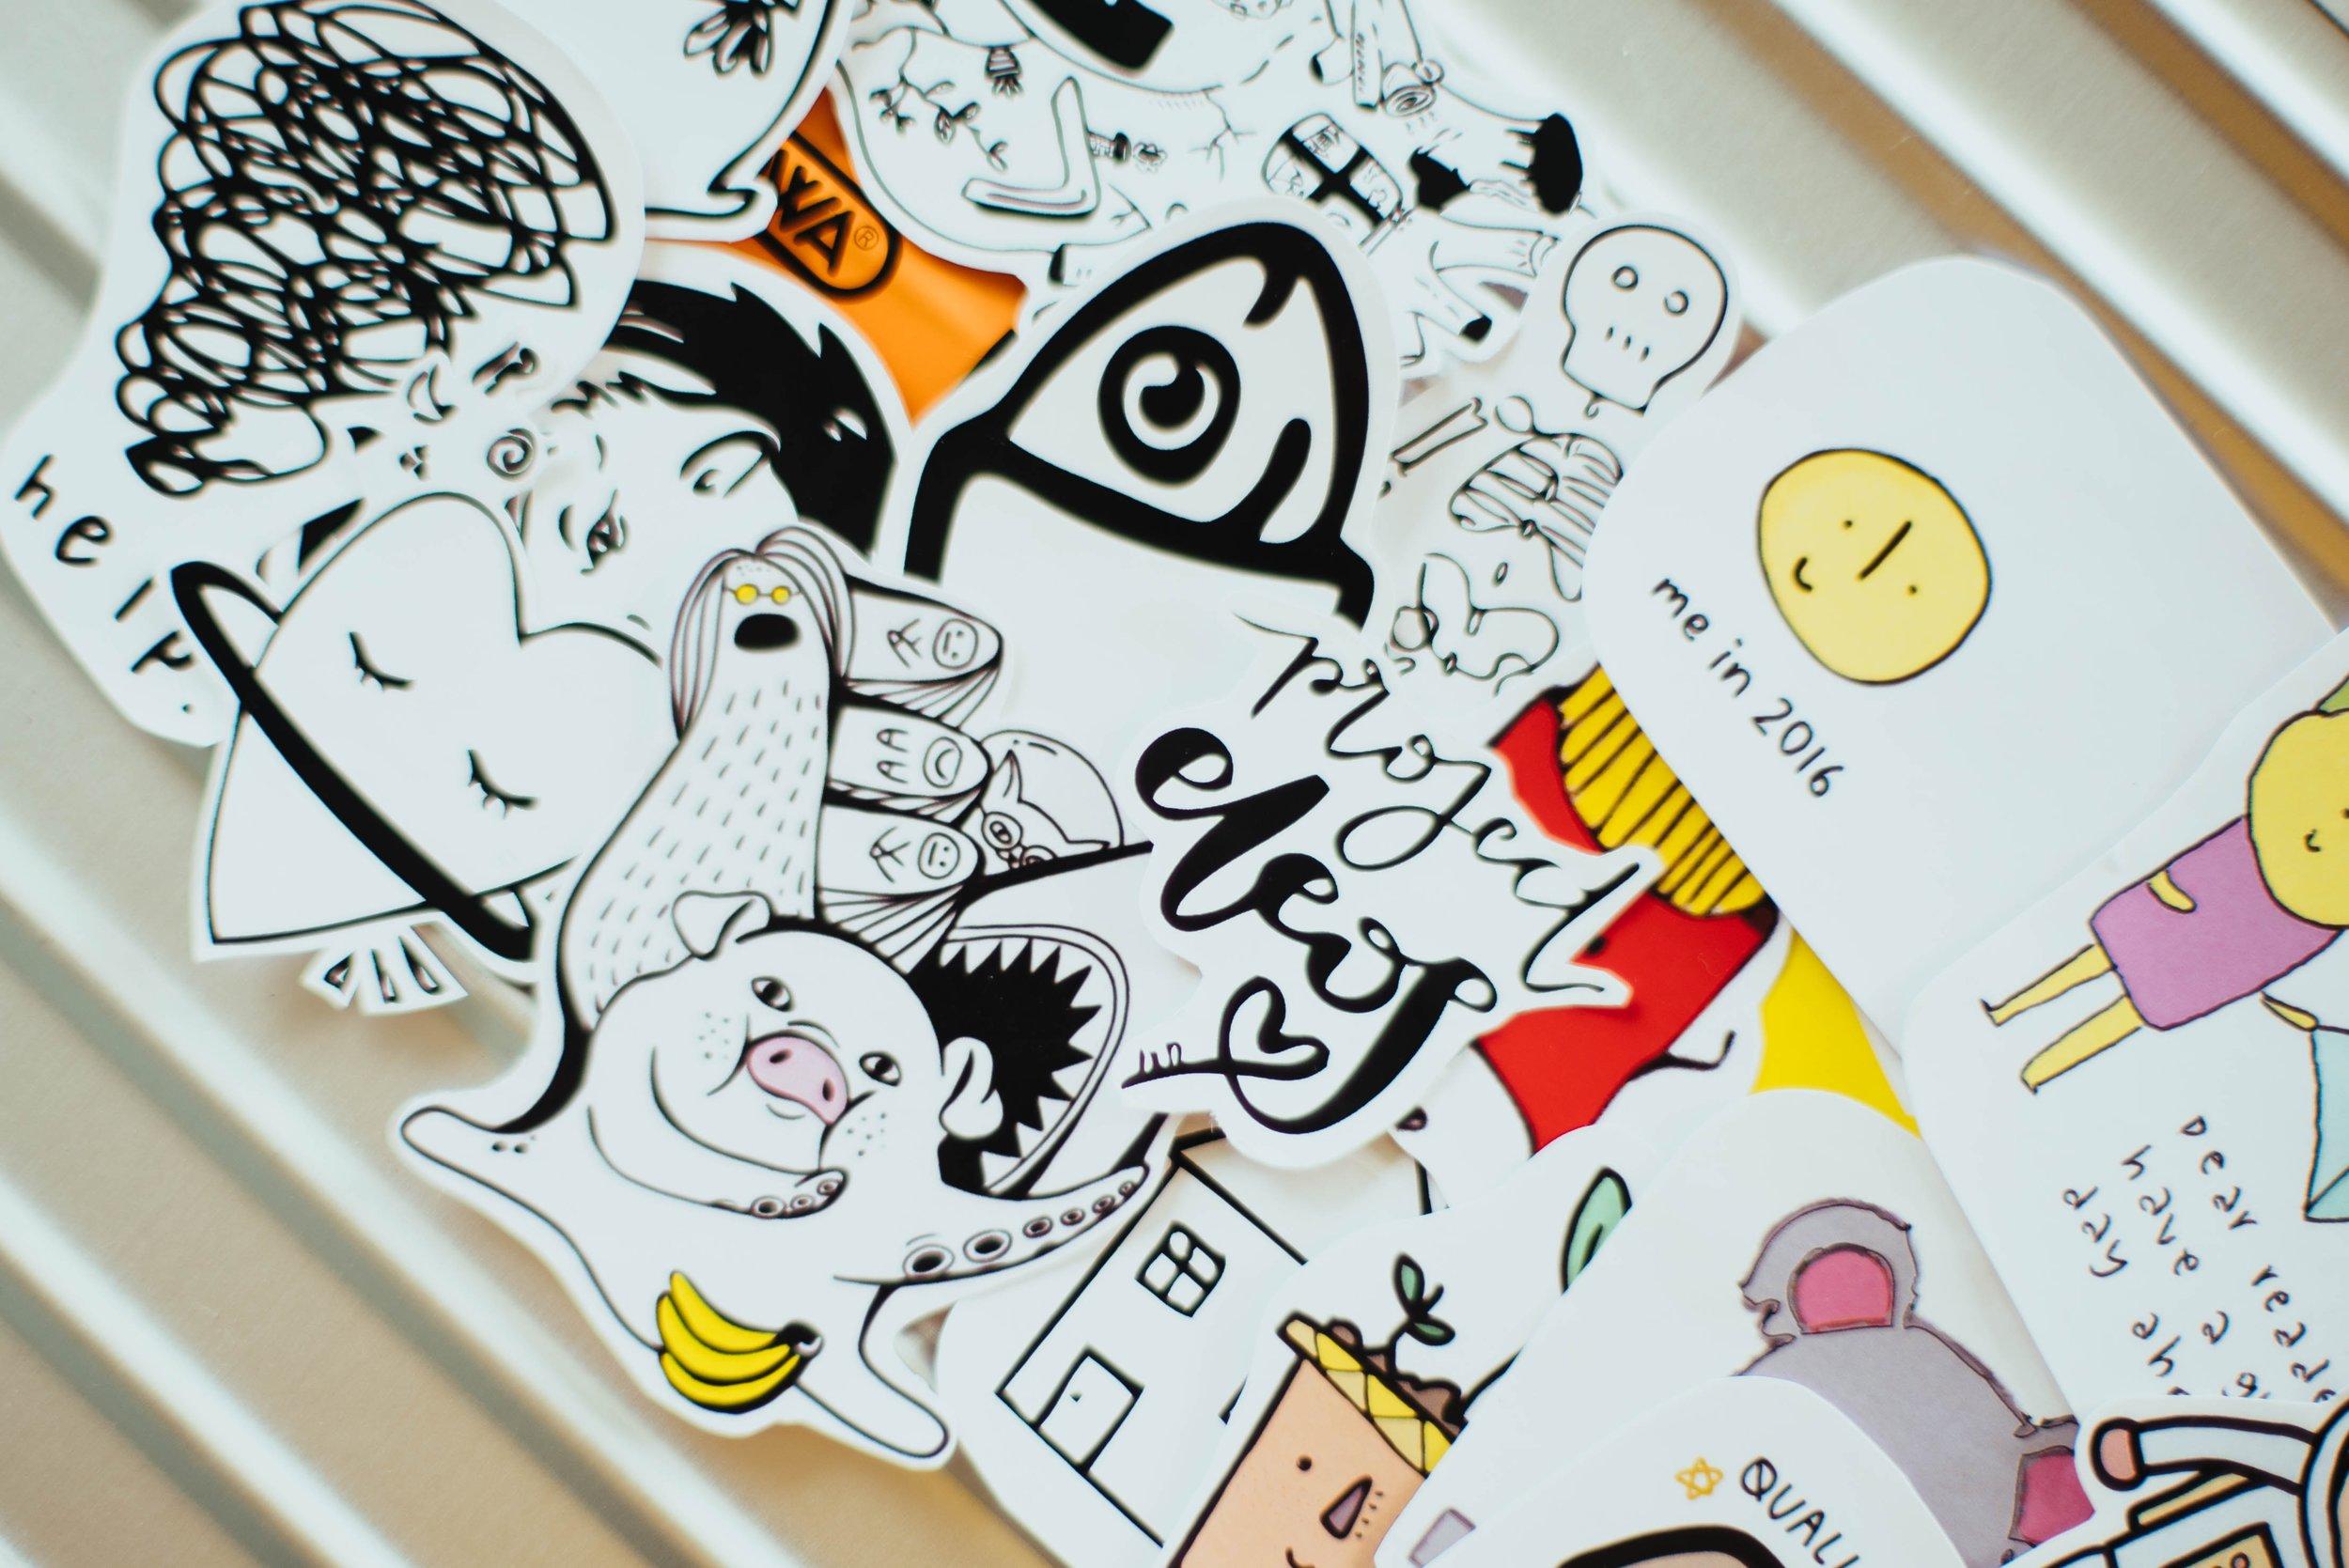 the-big-draw-yardley-arts.jpg